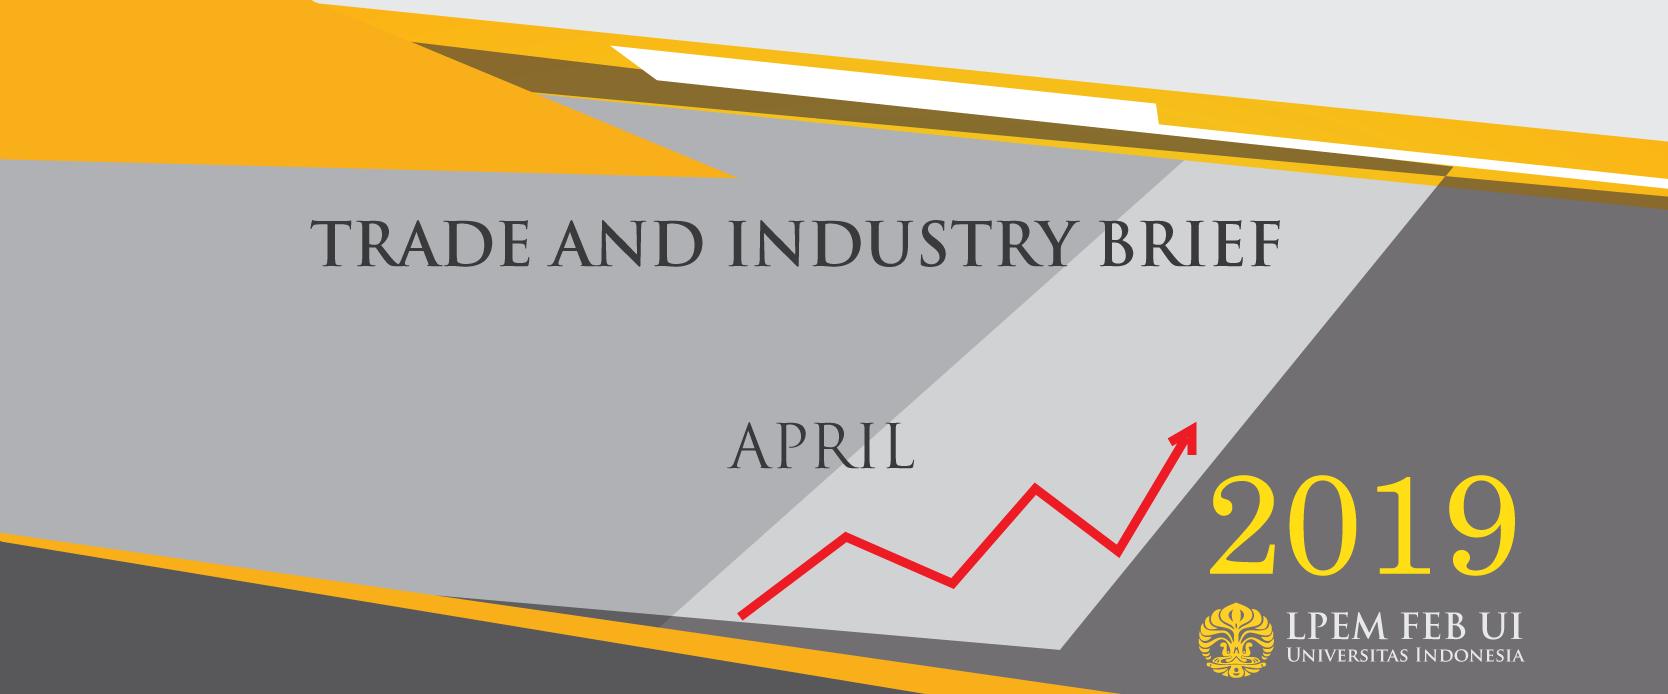 SERI ANALISIS EKONOMI: TRADE AND INDUSTRY BRIEF, April 2019